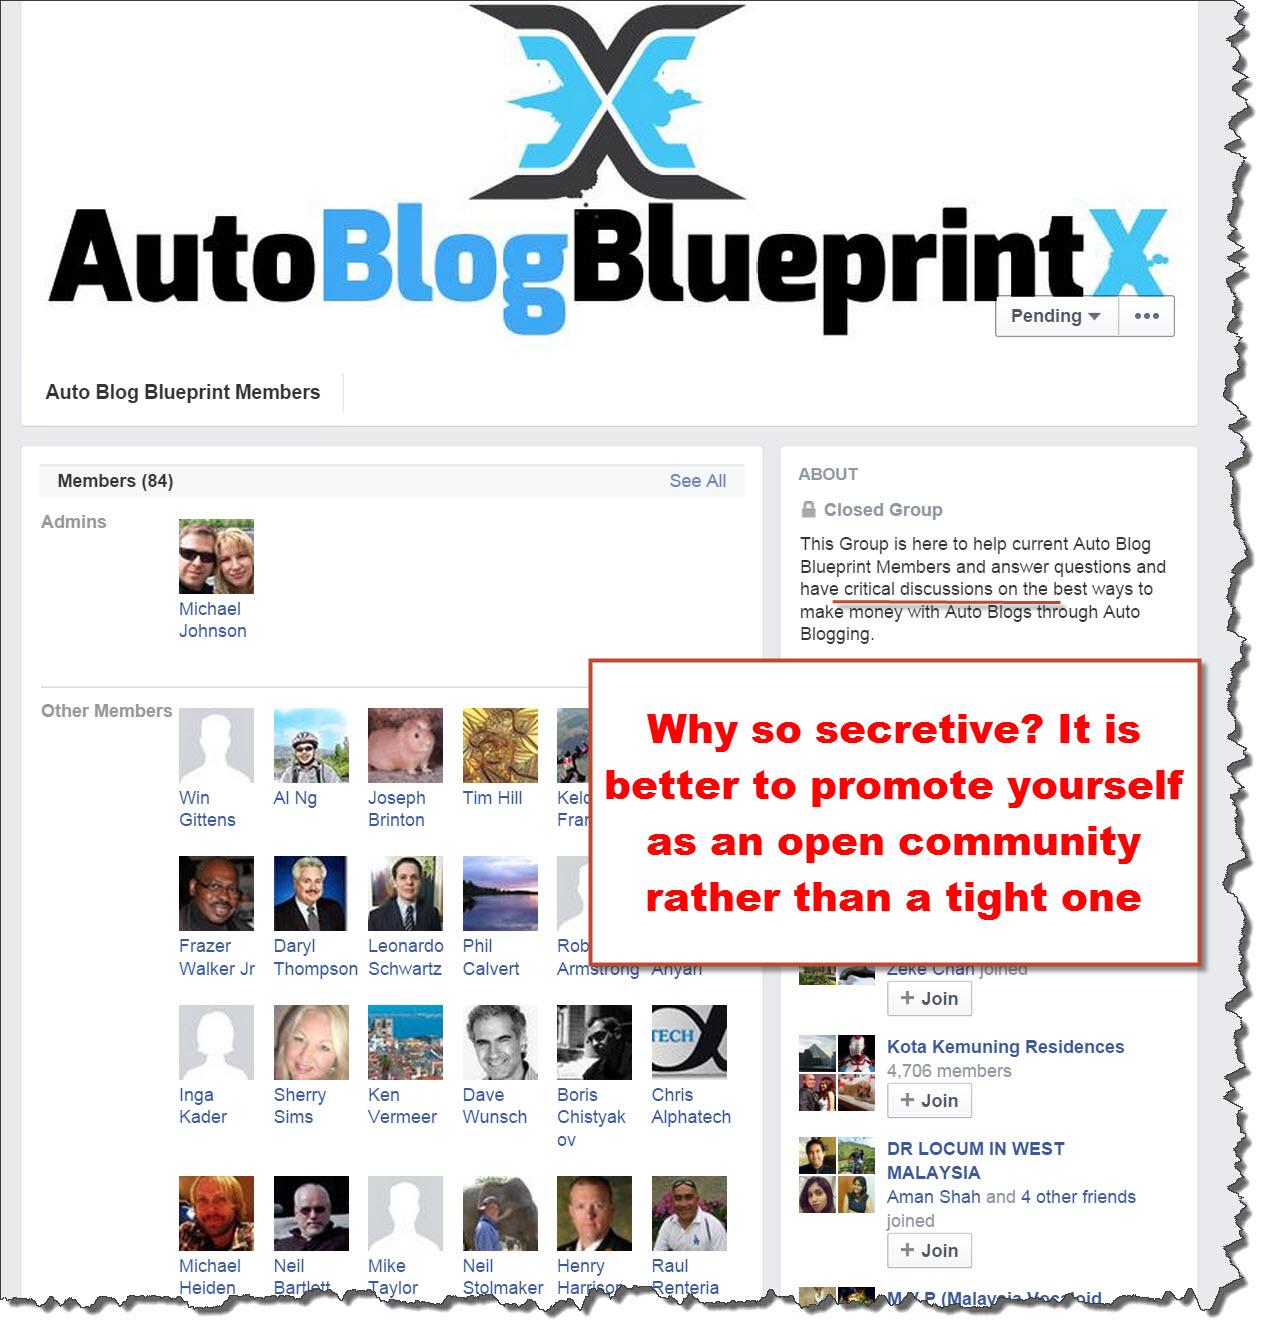 Autoblog blueprint FB